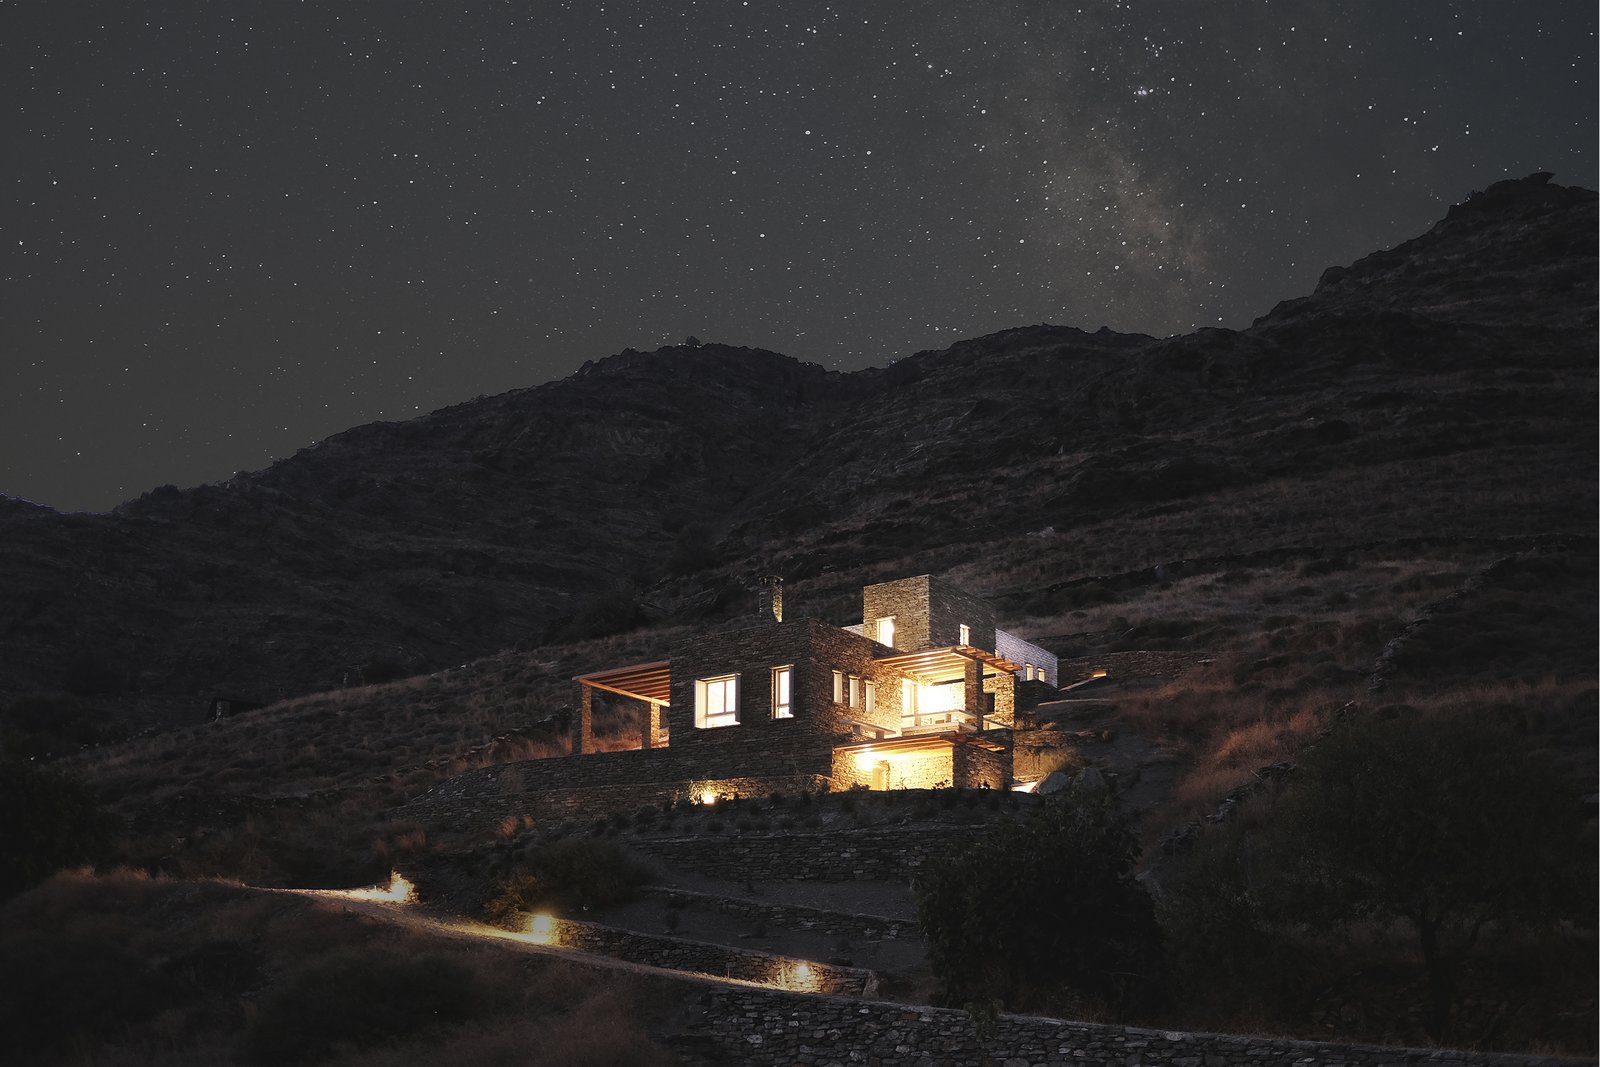 Summer night in a mediterranean island